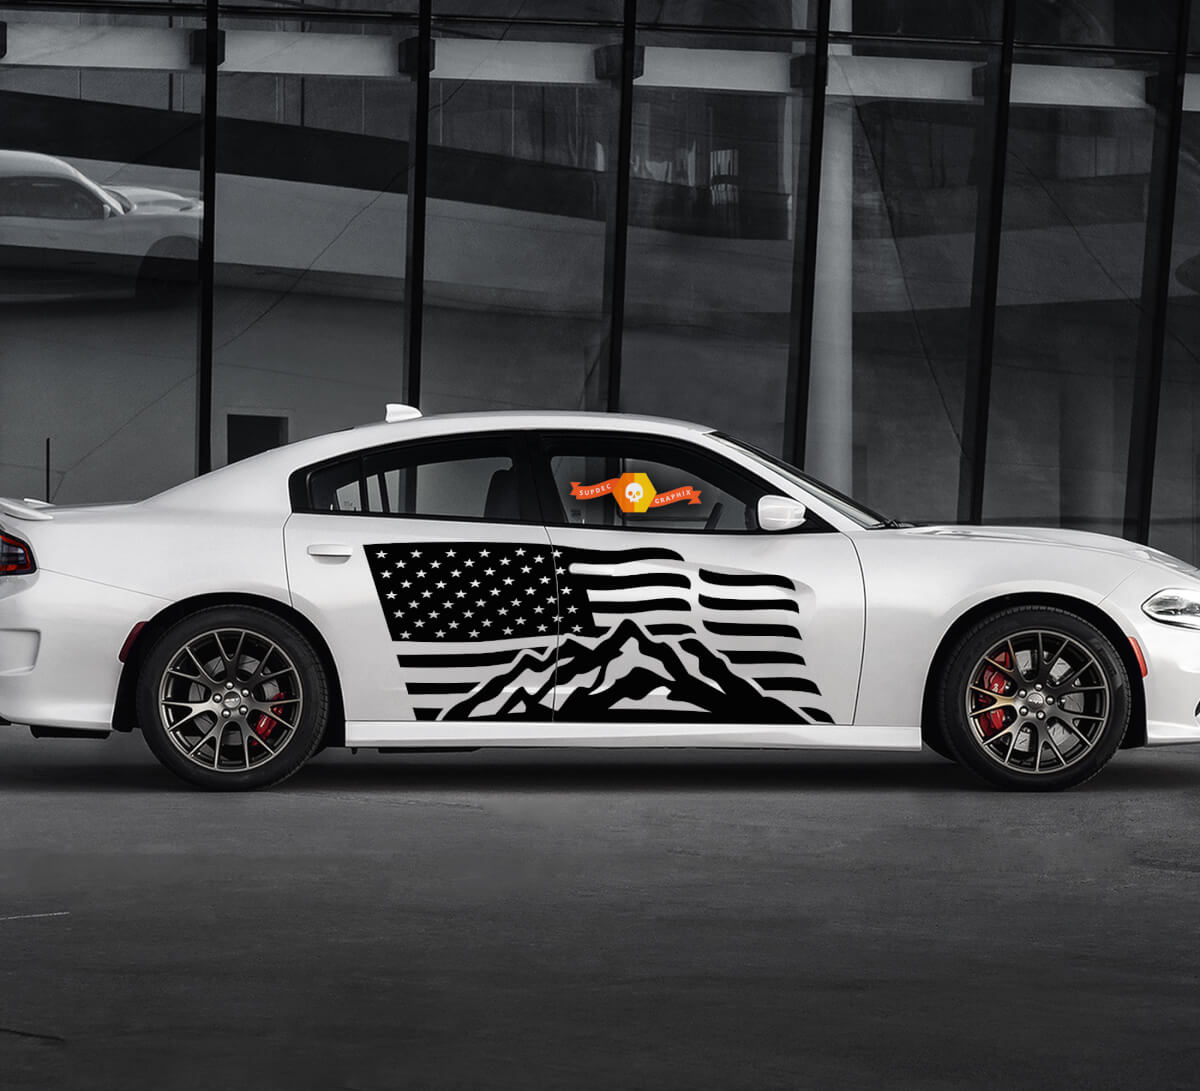 2 Seite Dodge Charger USA Flagge Berge Tür Seite Vinyl Aufkleber Grafik Aufkleber